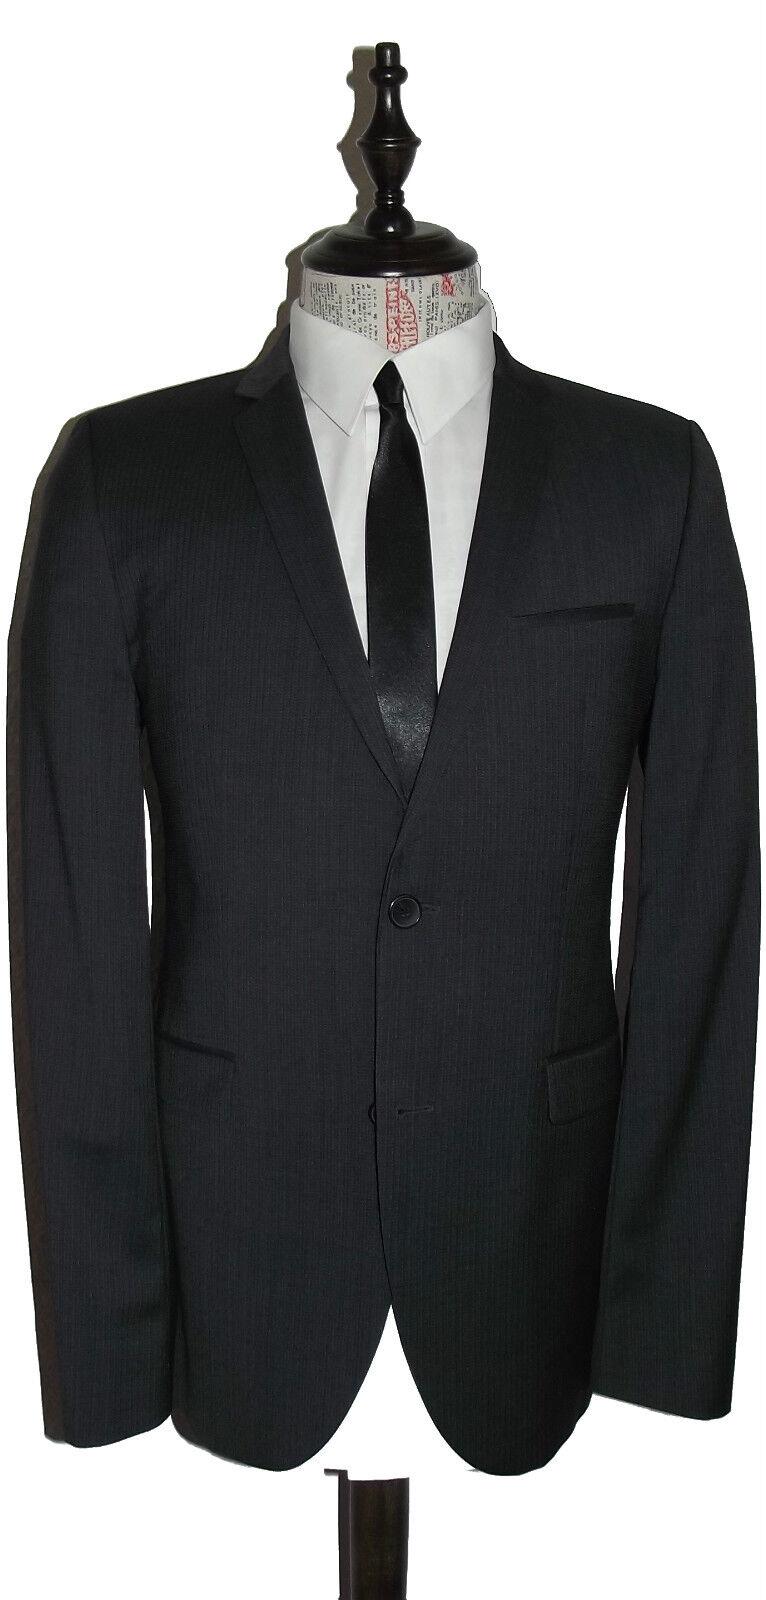 HUGO BOSS Luxus Anzug Gr. 98 Adris/Heibo1 Dunkelgrau NEUWERTIG ROT Label NP: